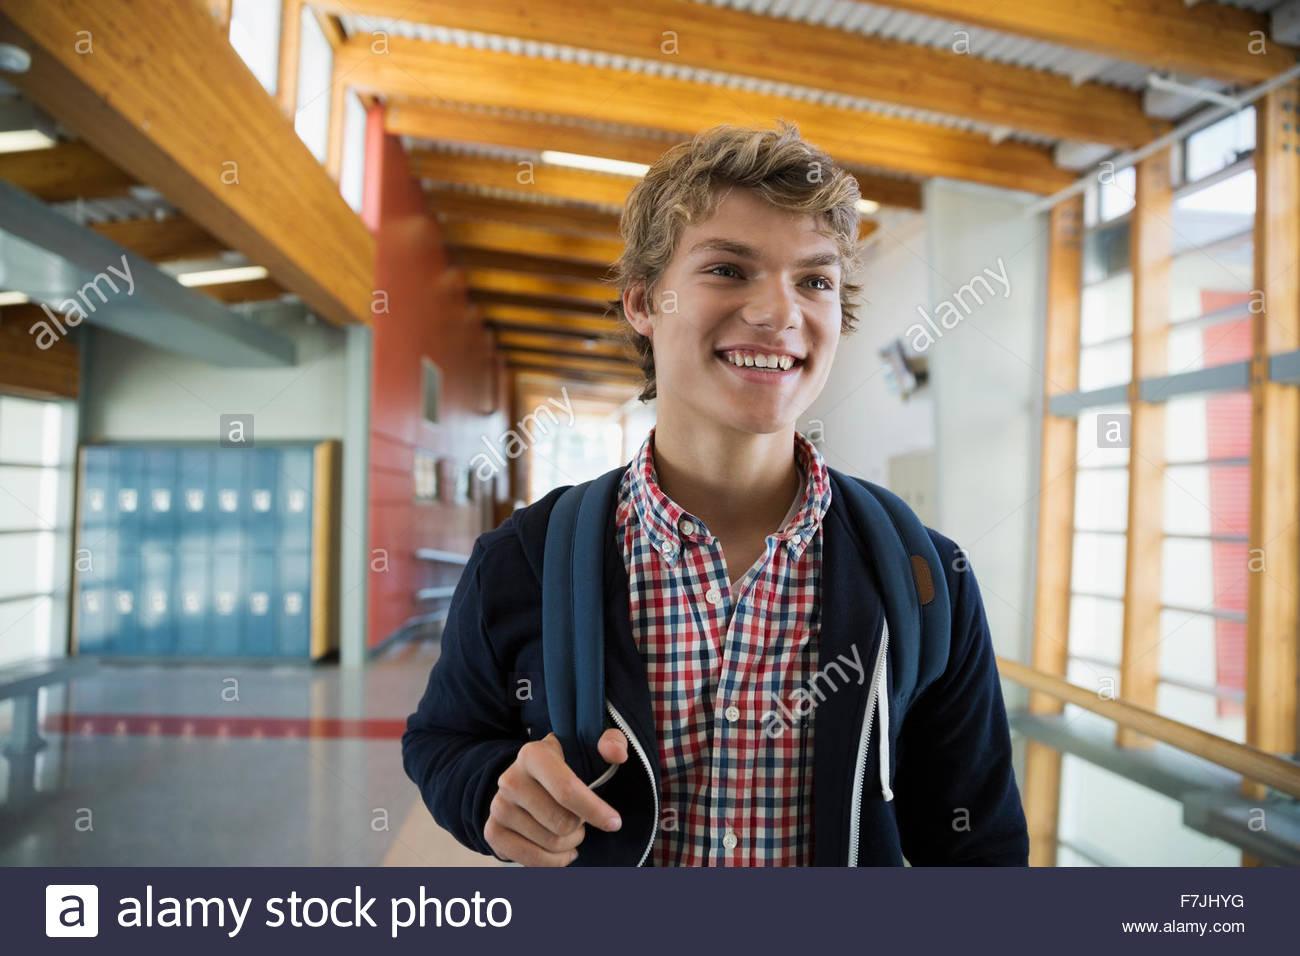 High school student Smiling in corridor Photo Stock